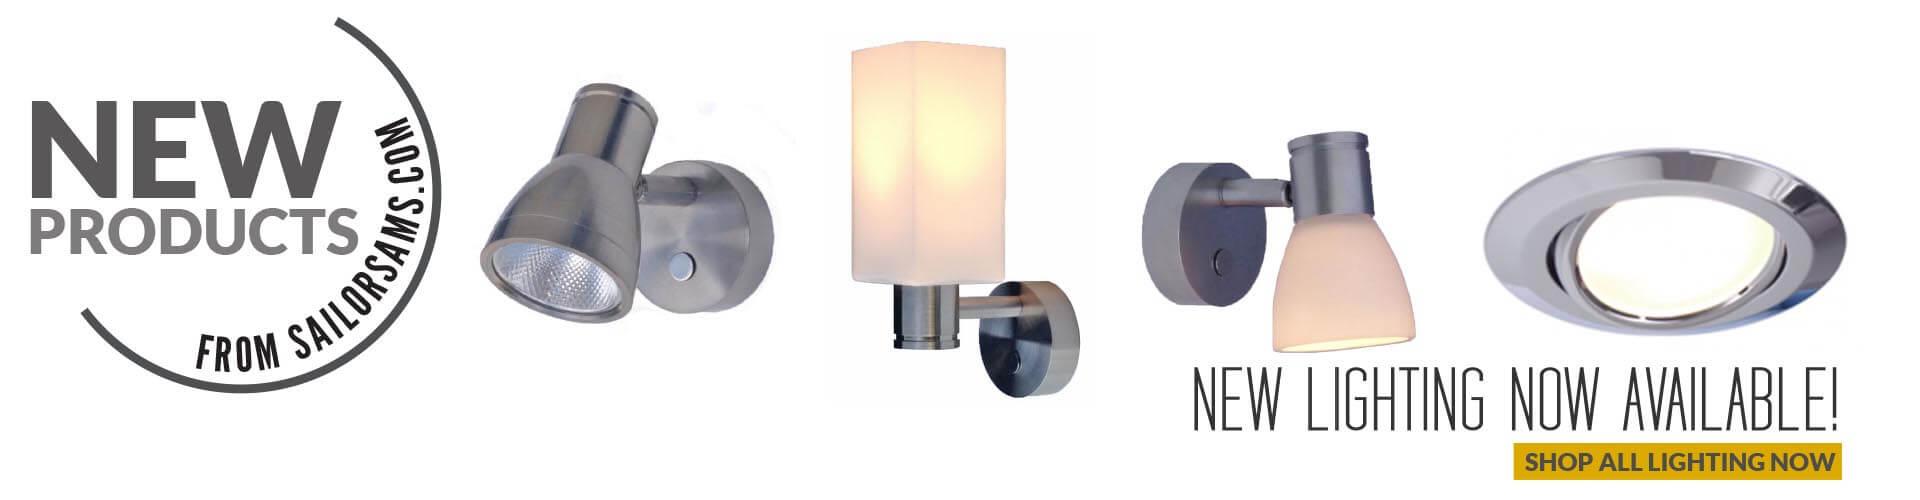 Marine diy solutions at sailorsams brand new frilight light fixtures arubaitofo Image collections